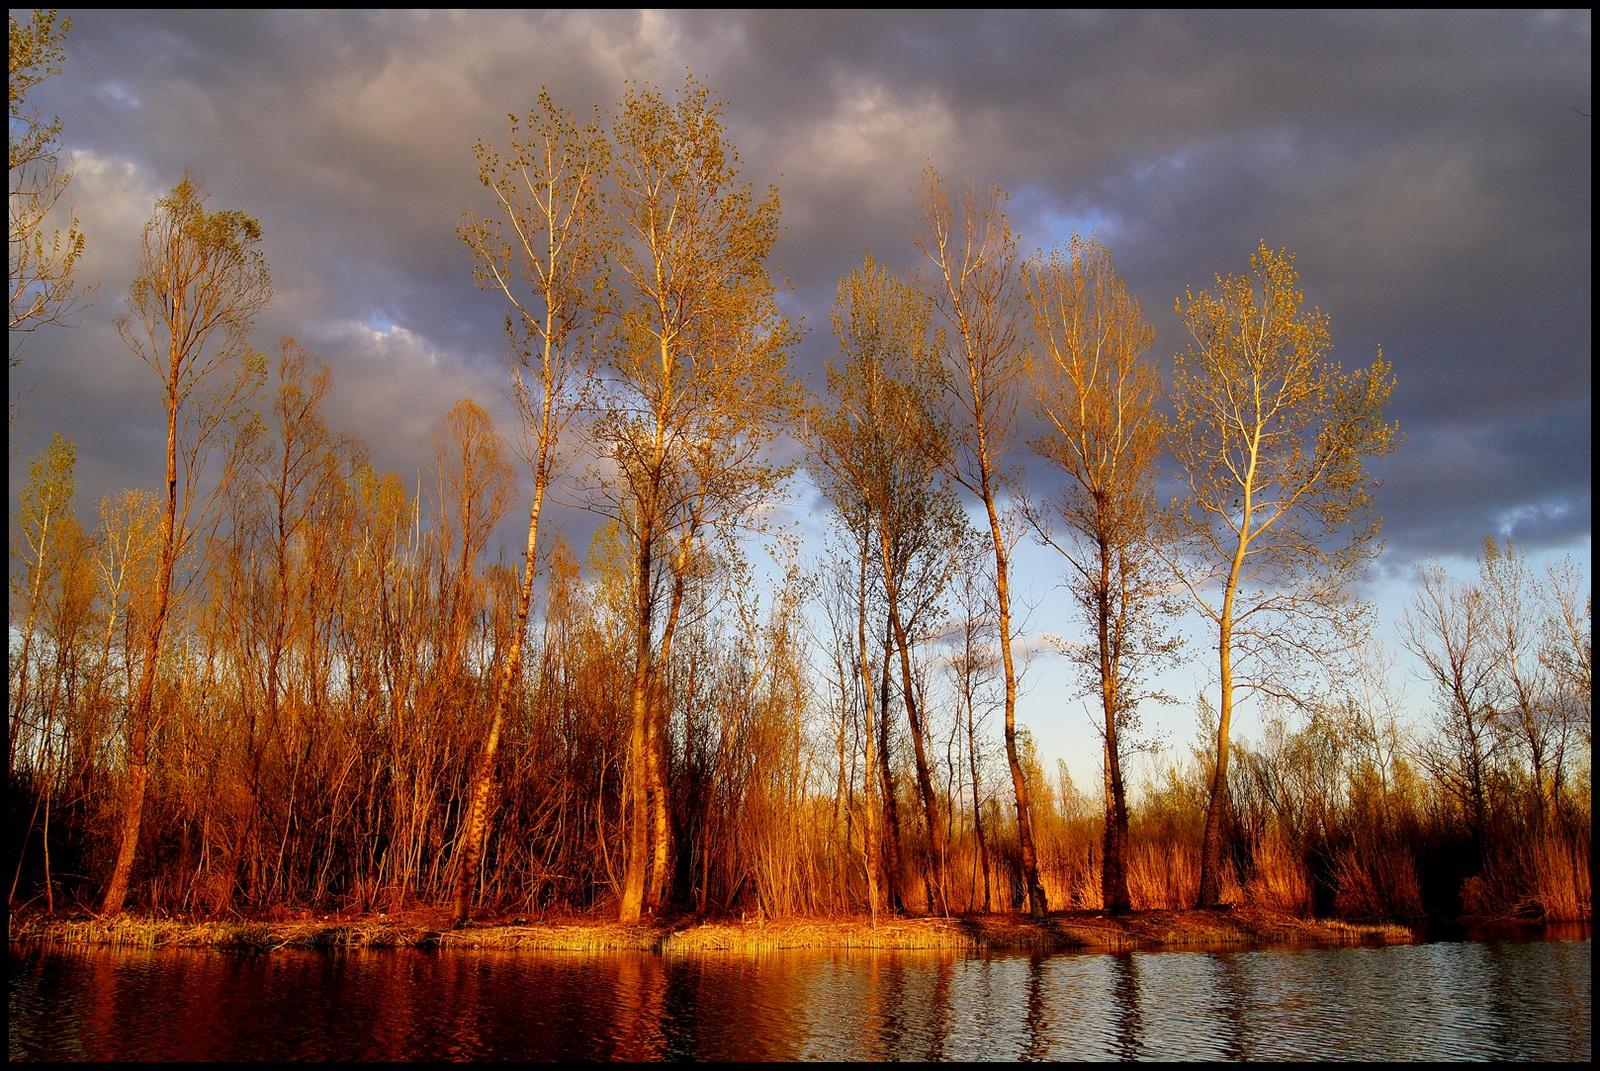 Fák a tóparton 4